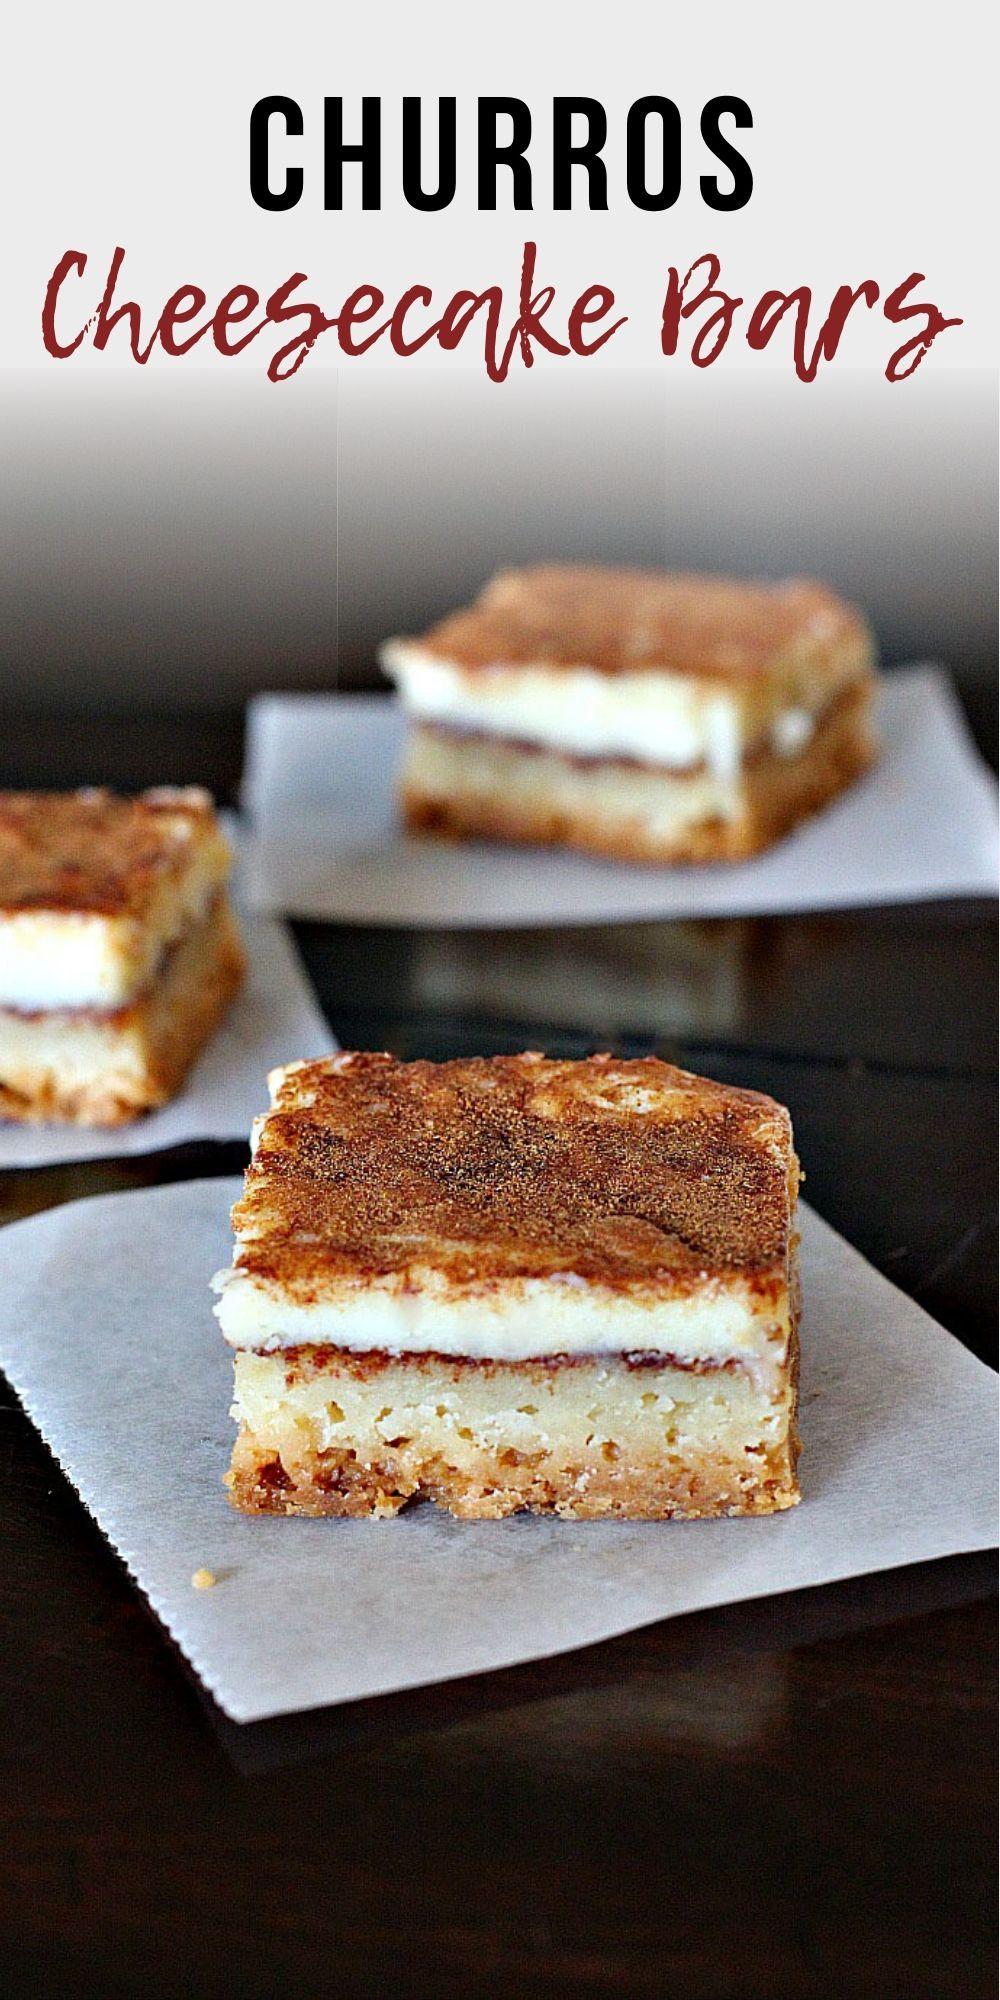 Churros Cheesecake Bars. Perfect Kid-friendly Mexican Dessert